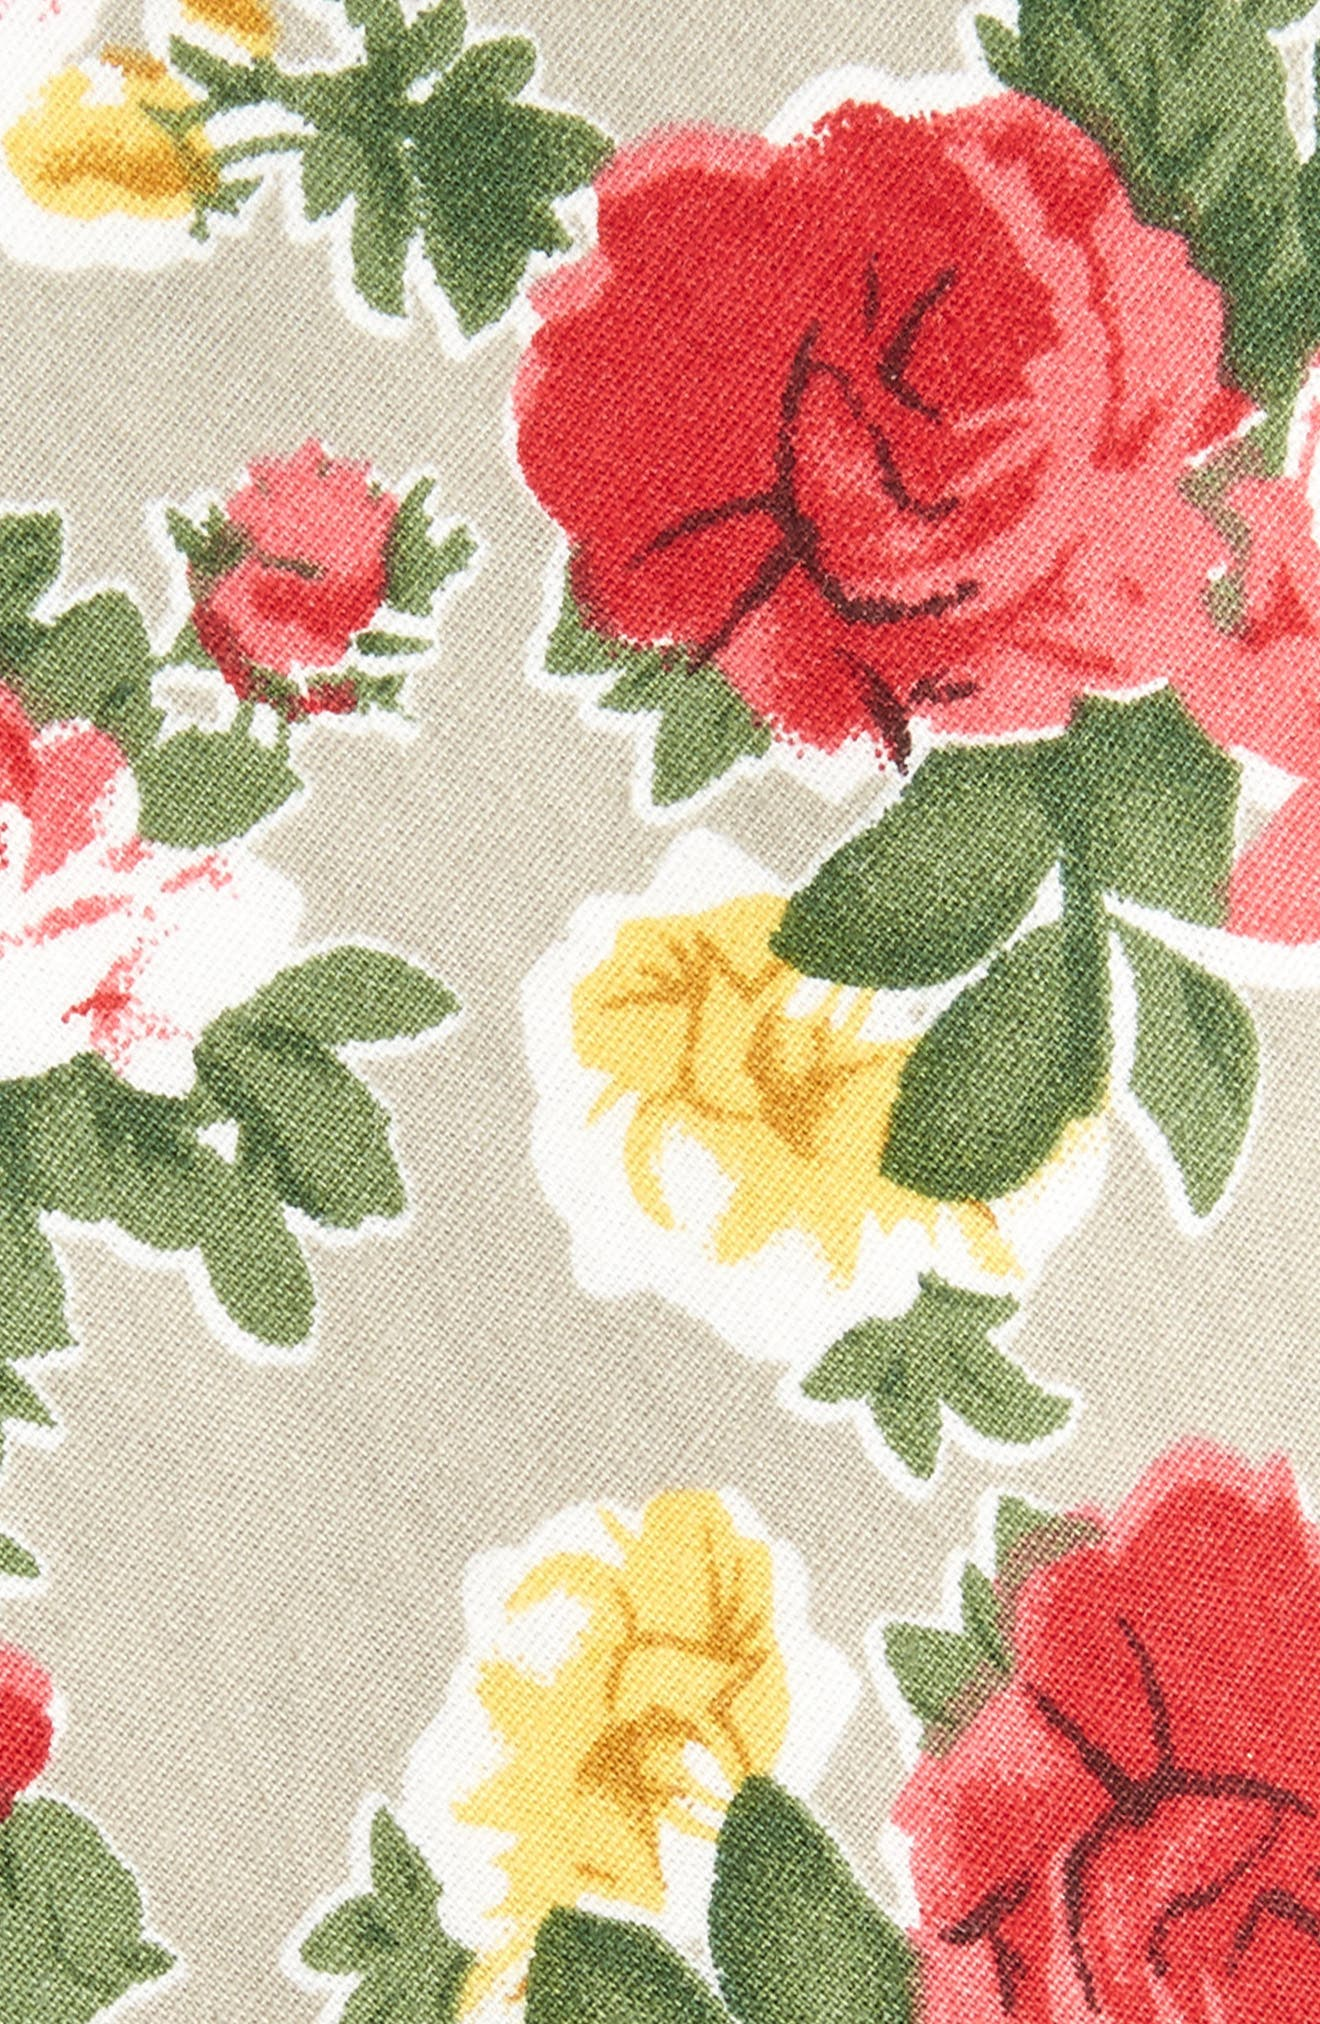 Iverson Floral Cotton Skinny Tie,                             Alternate thumbnail 3, color,